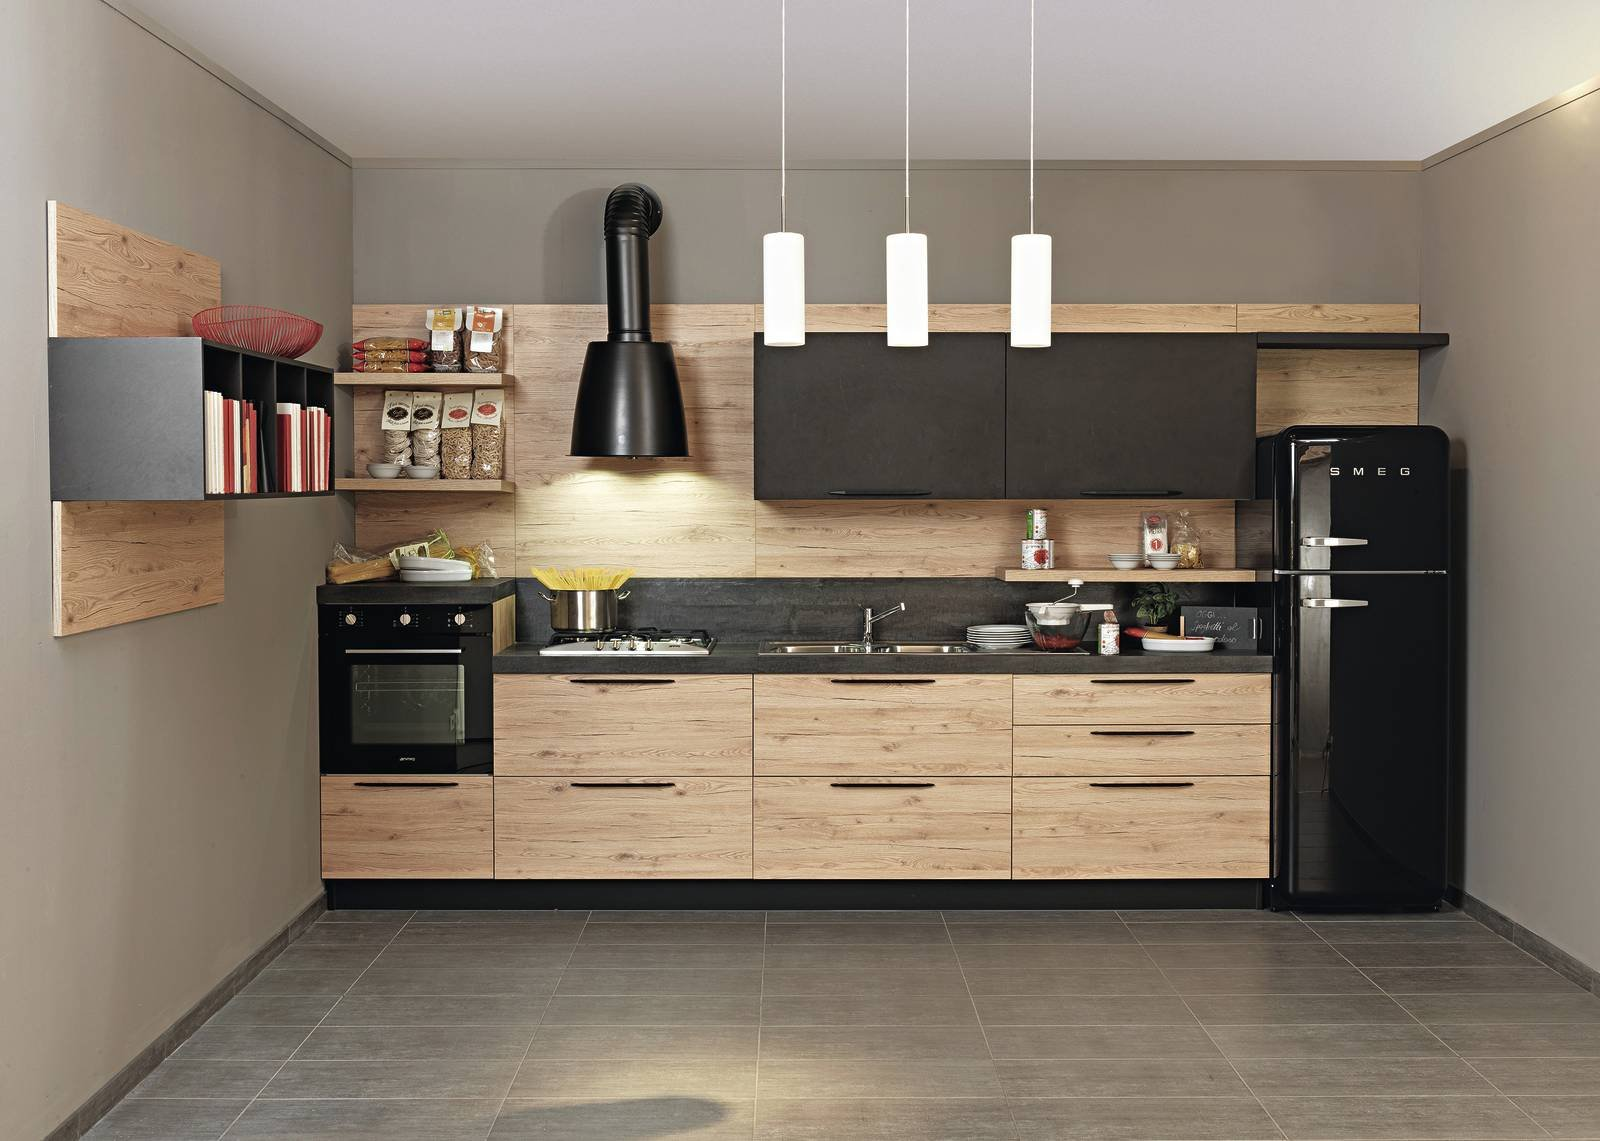 Awesome Ricci Casa Soggiorni Images - Design Trends 2017 - shopmakers.us